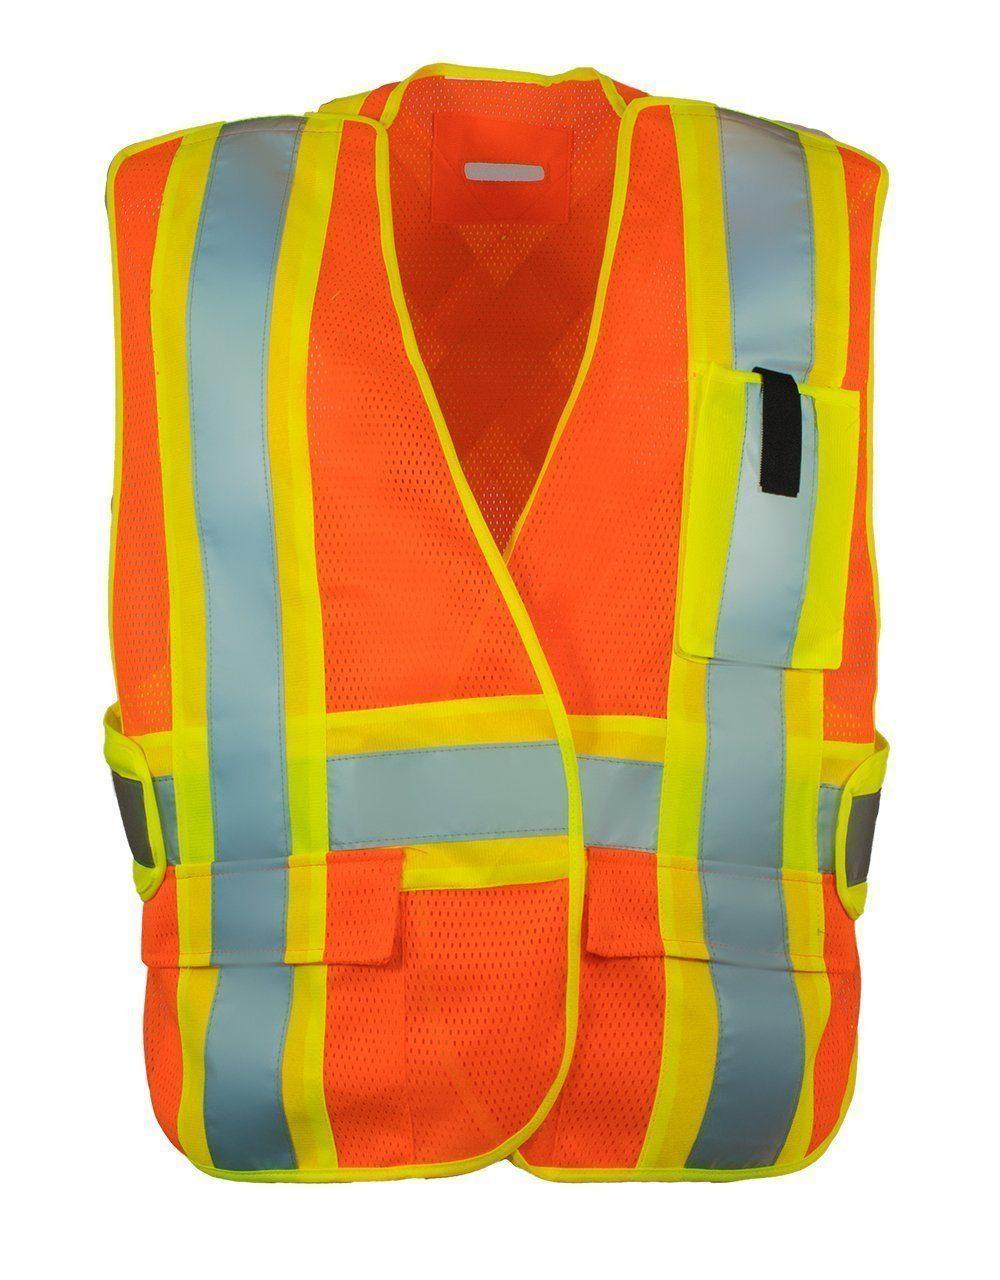 Safety Vest - Hi-Viz - Forcefield (L/XL)